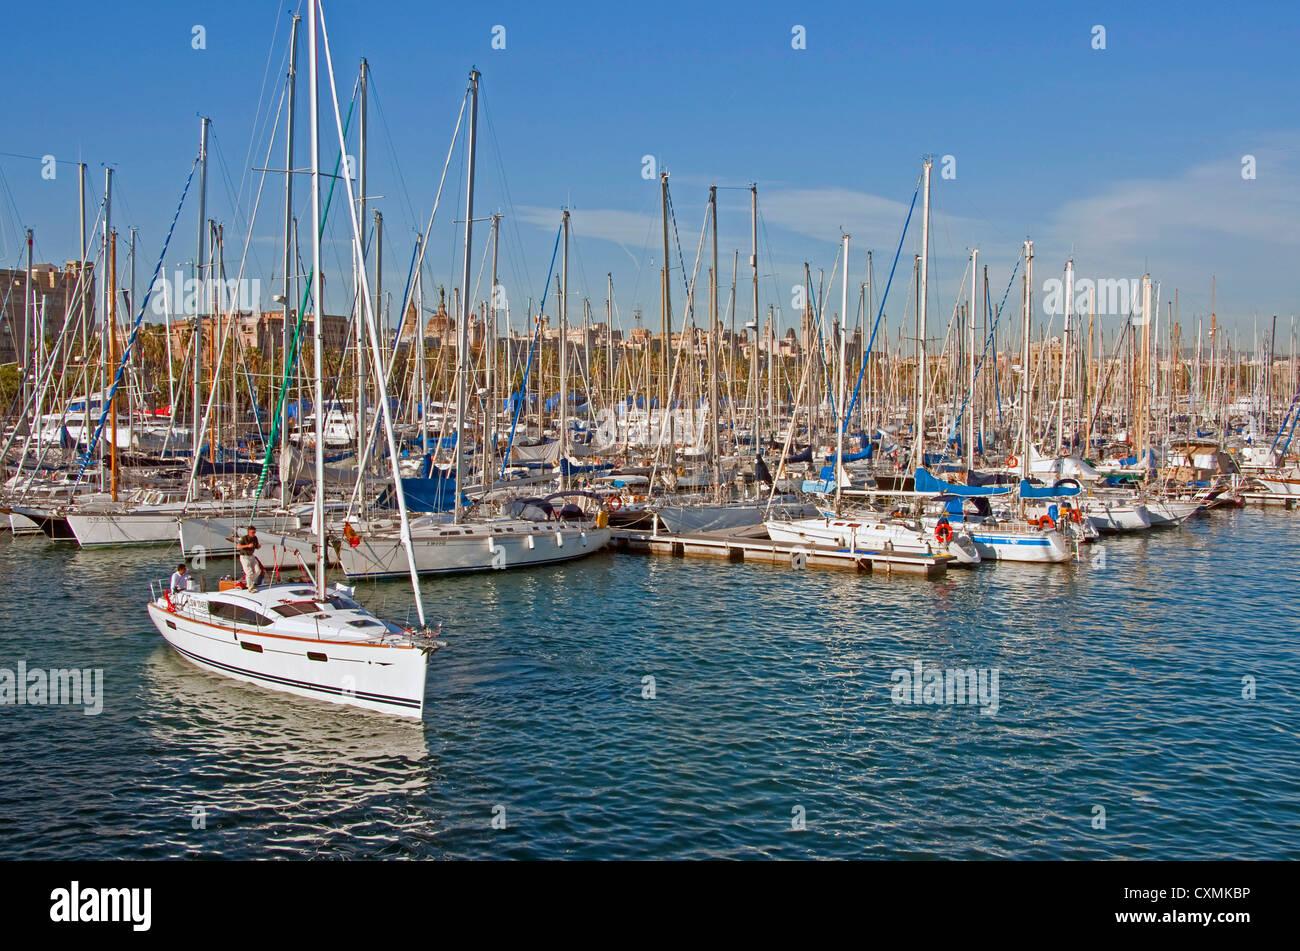 Barcelona's Darsena Nacional marina at Port Vell - Stock Image